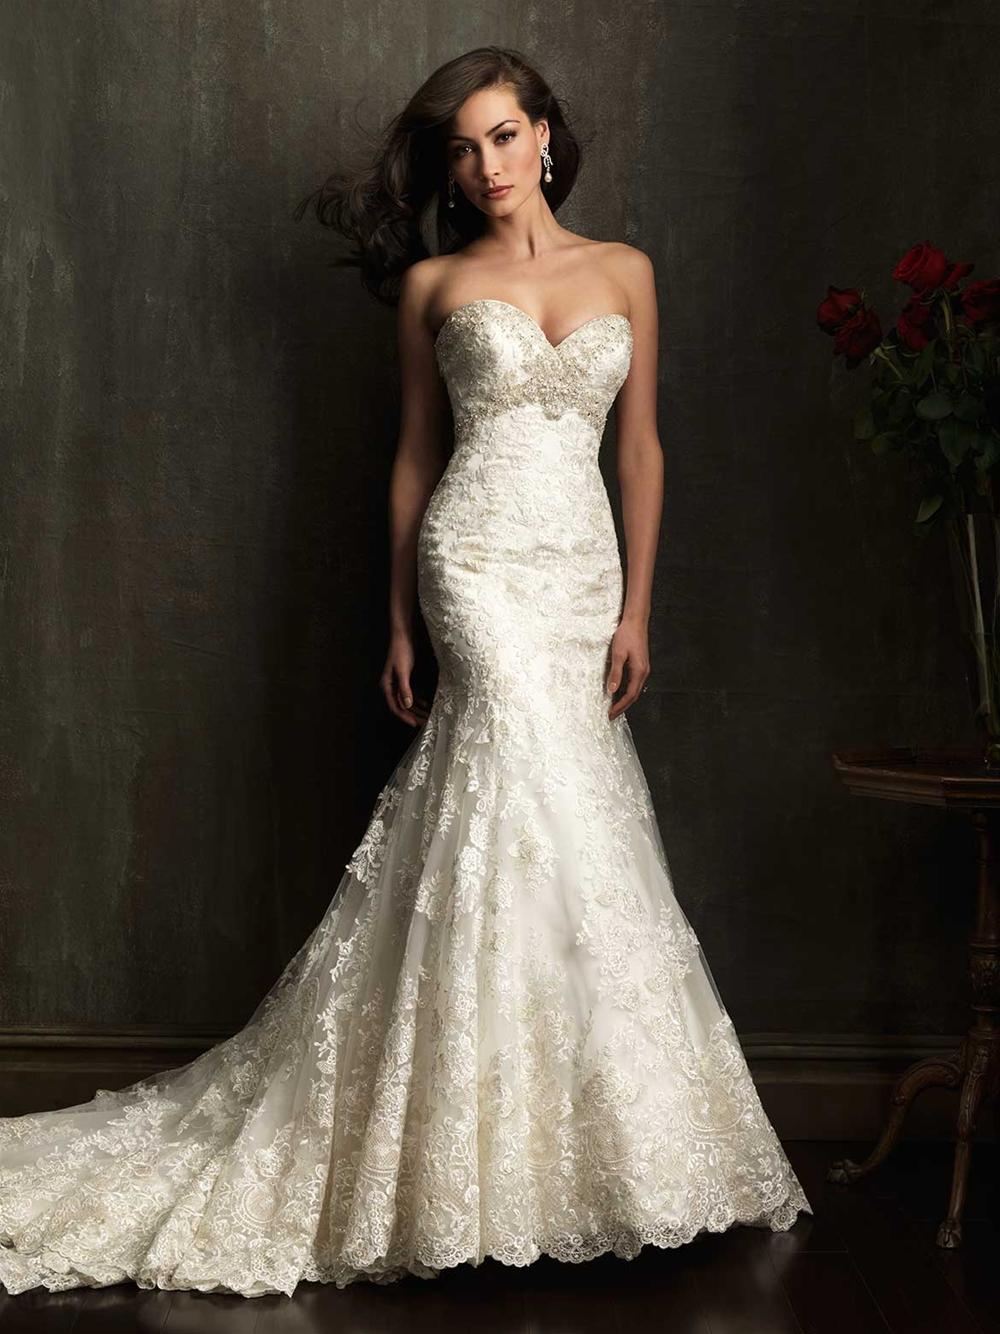 Allure Bridal Gold